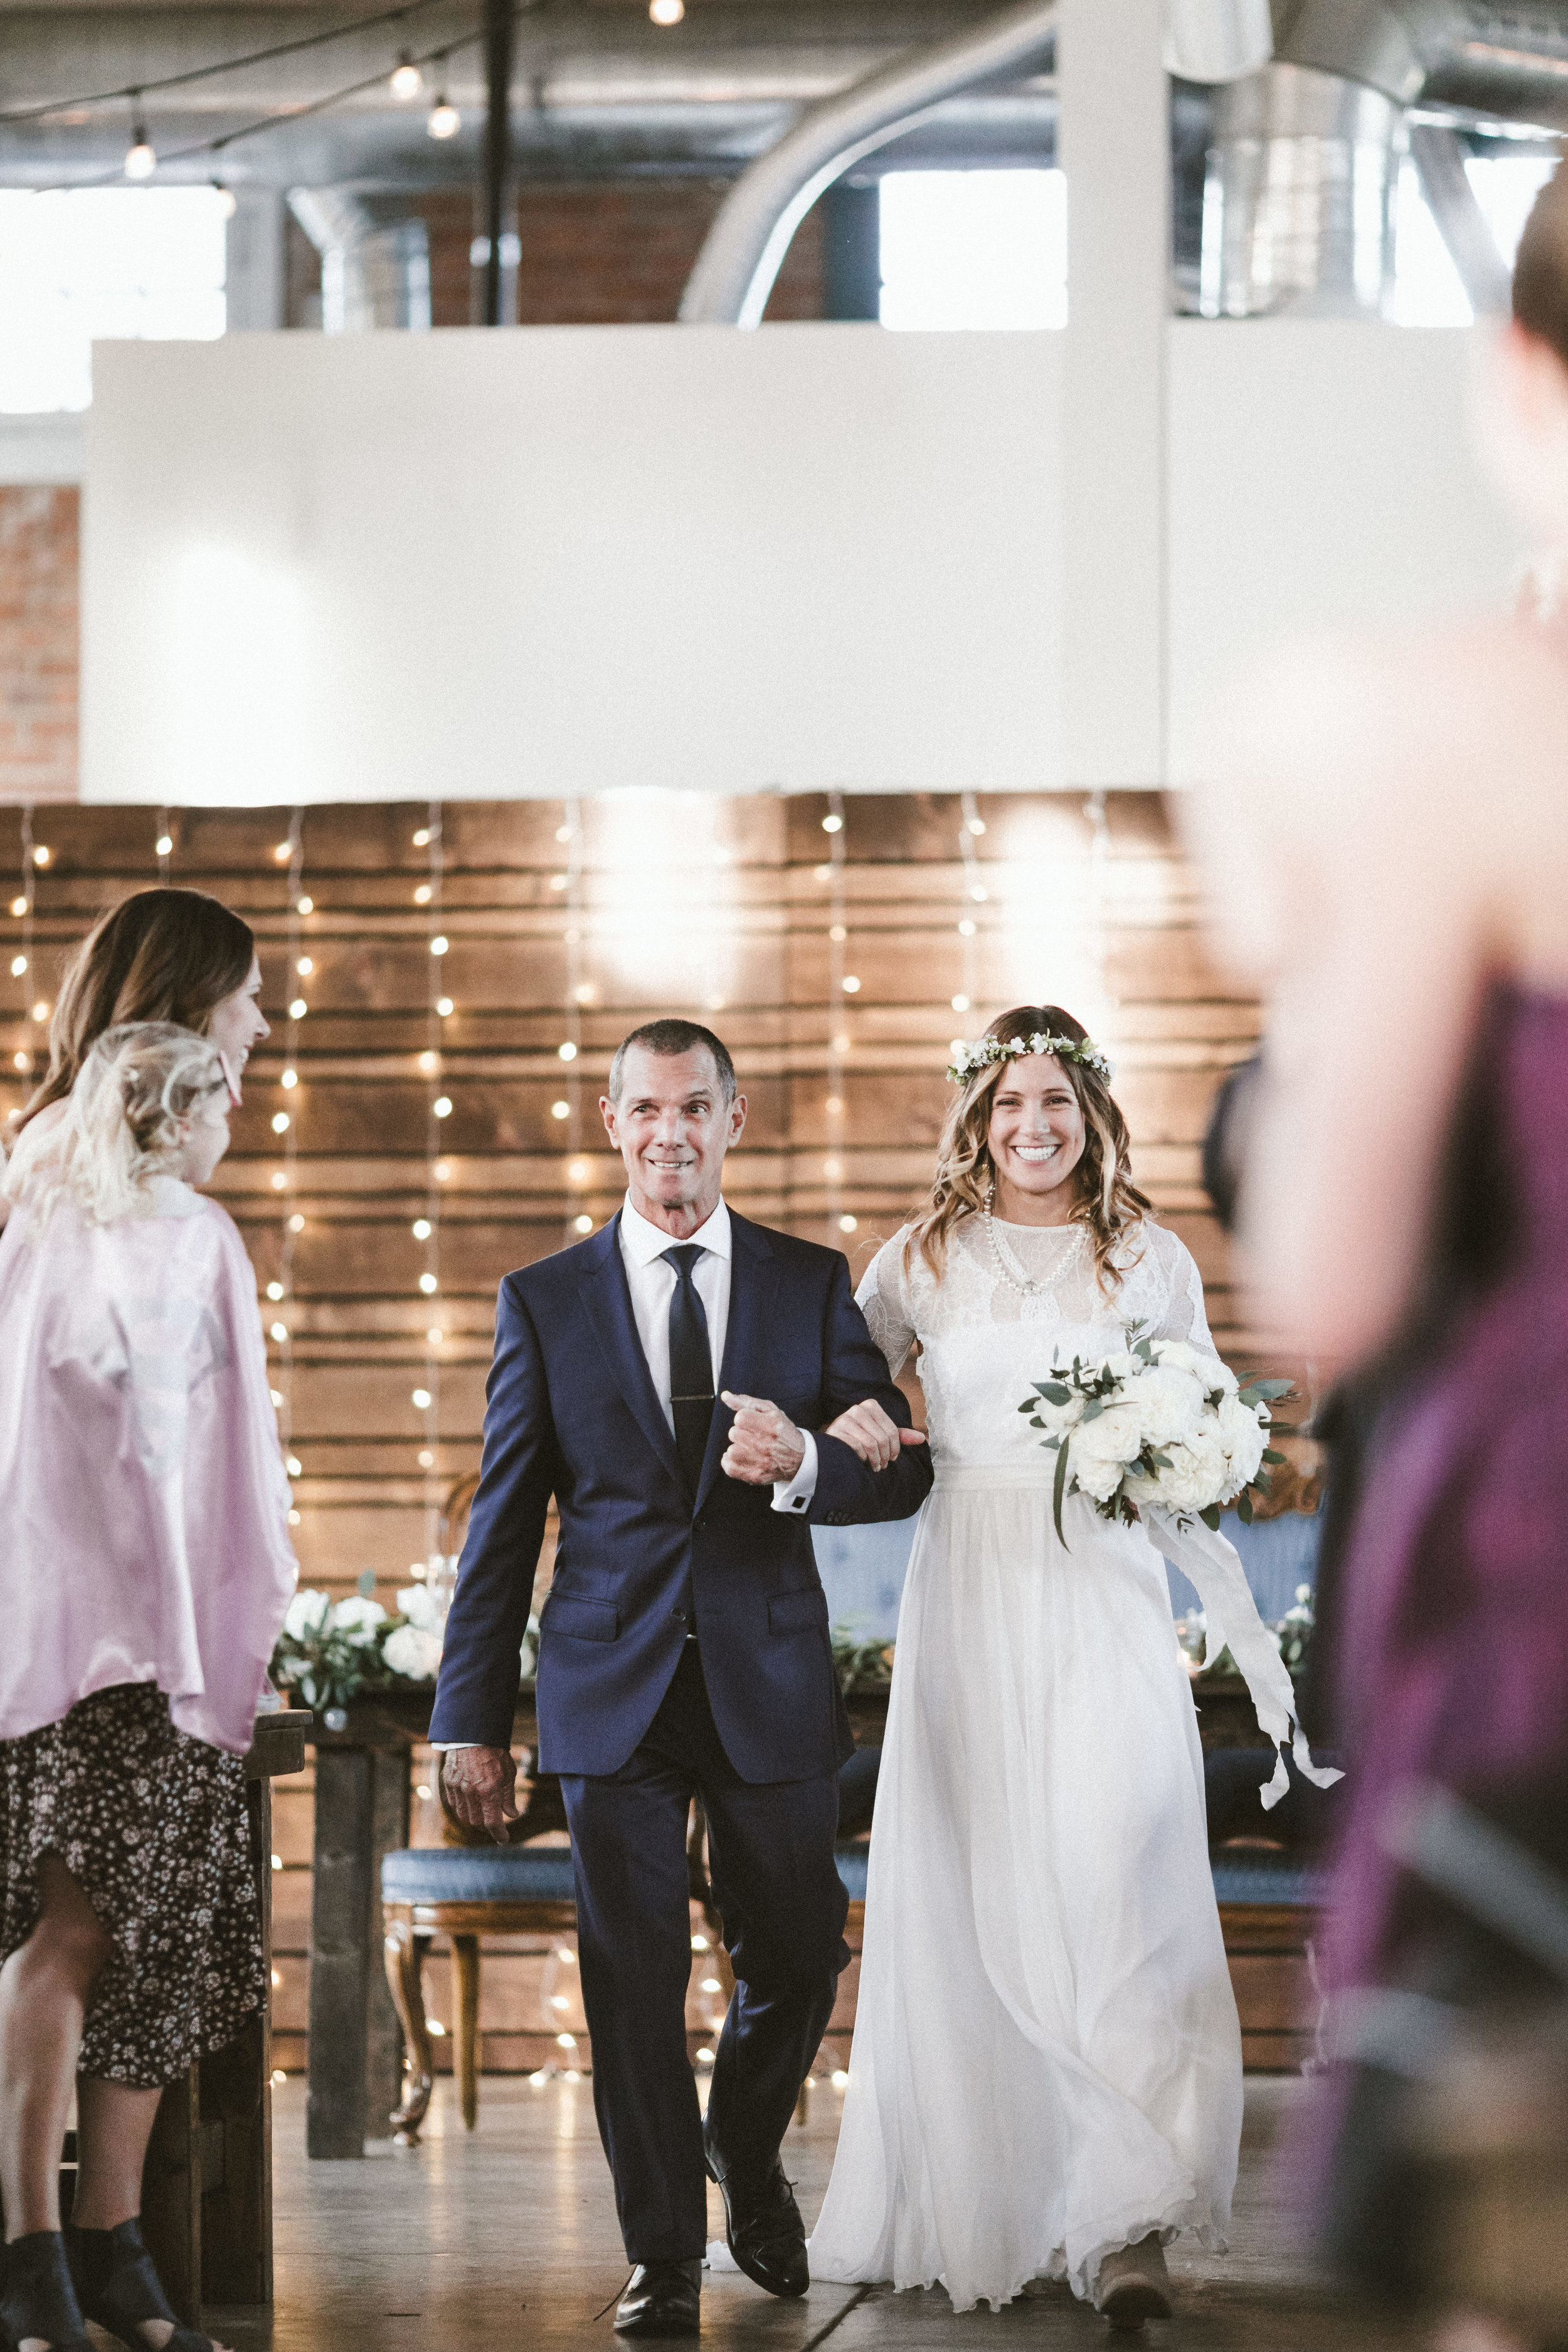 Bridal Bouquet Tony-Gambino-Photography-1241.jpg